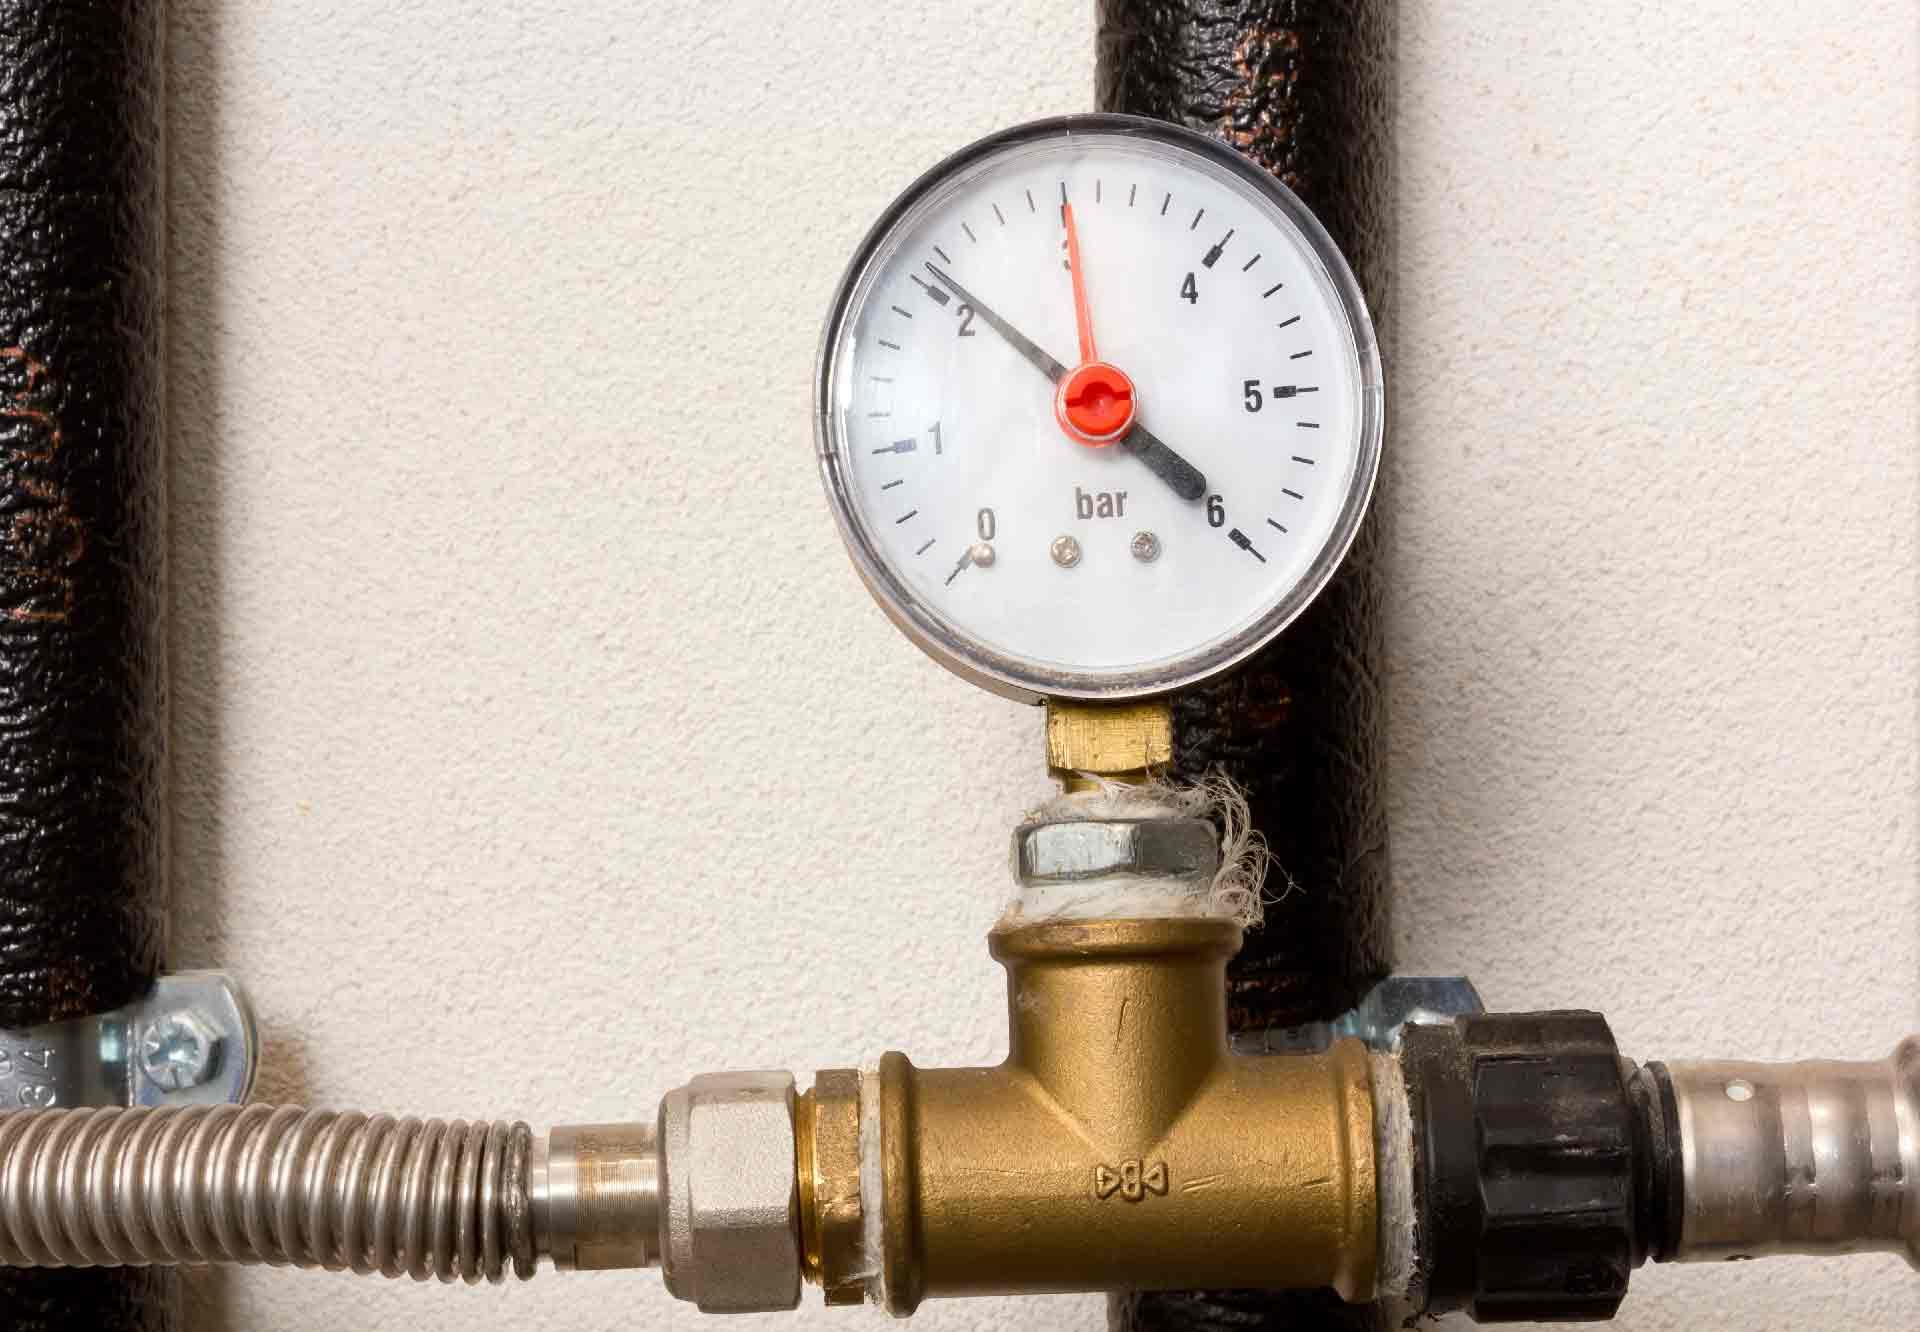 Heater pressure